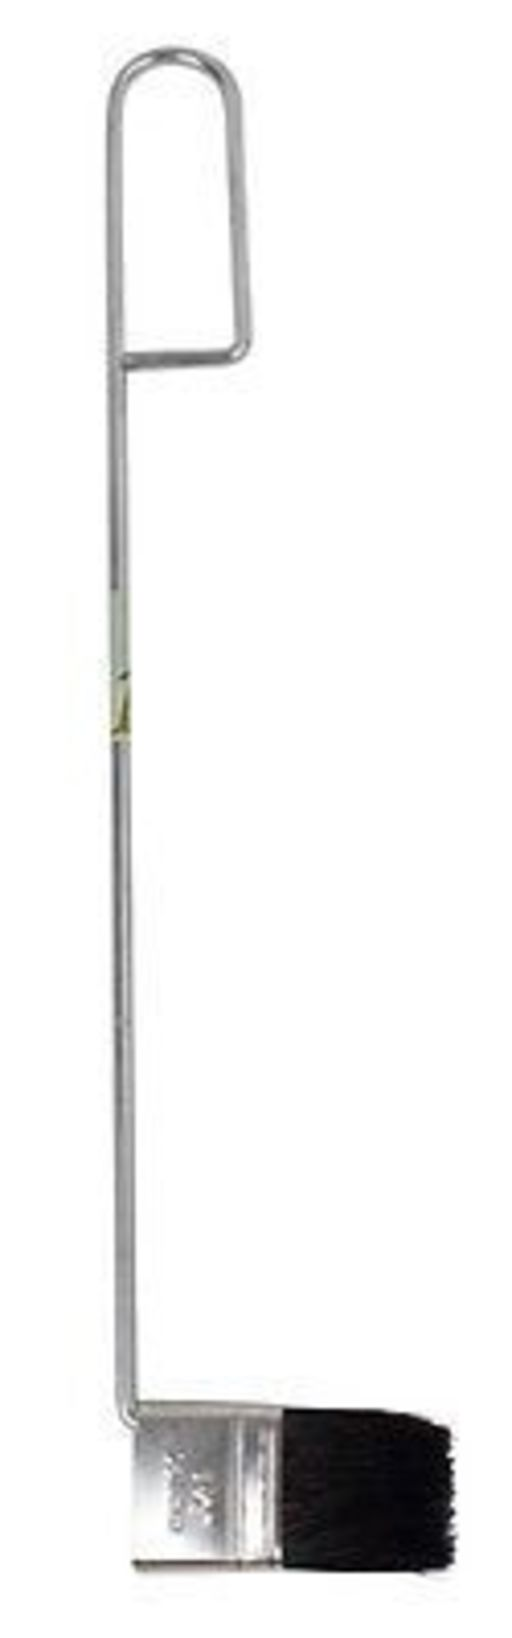 Radiator Brush, 1.5 inch Image 1